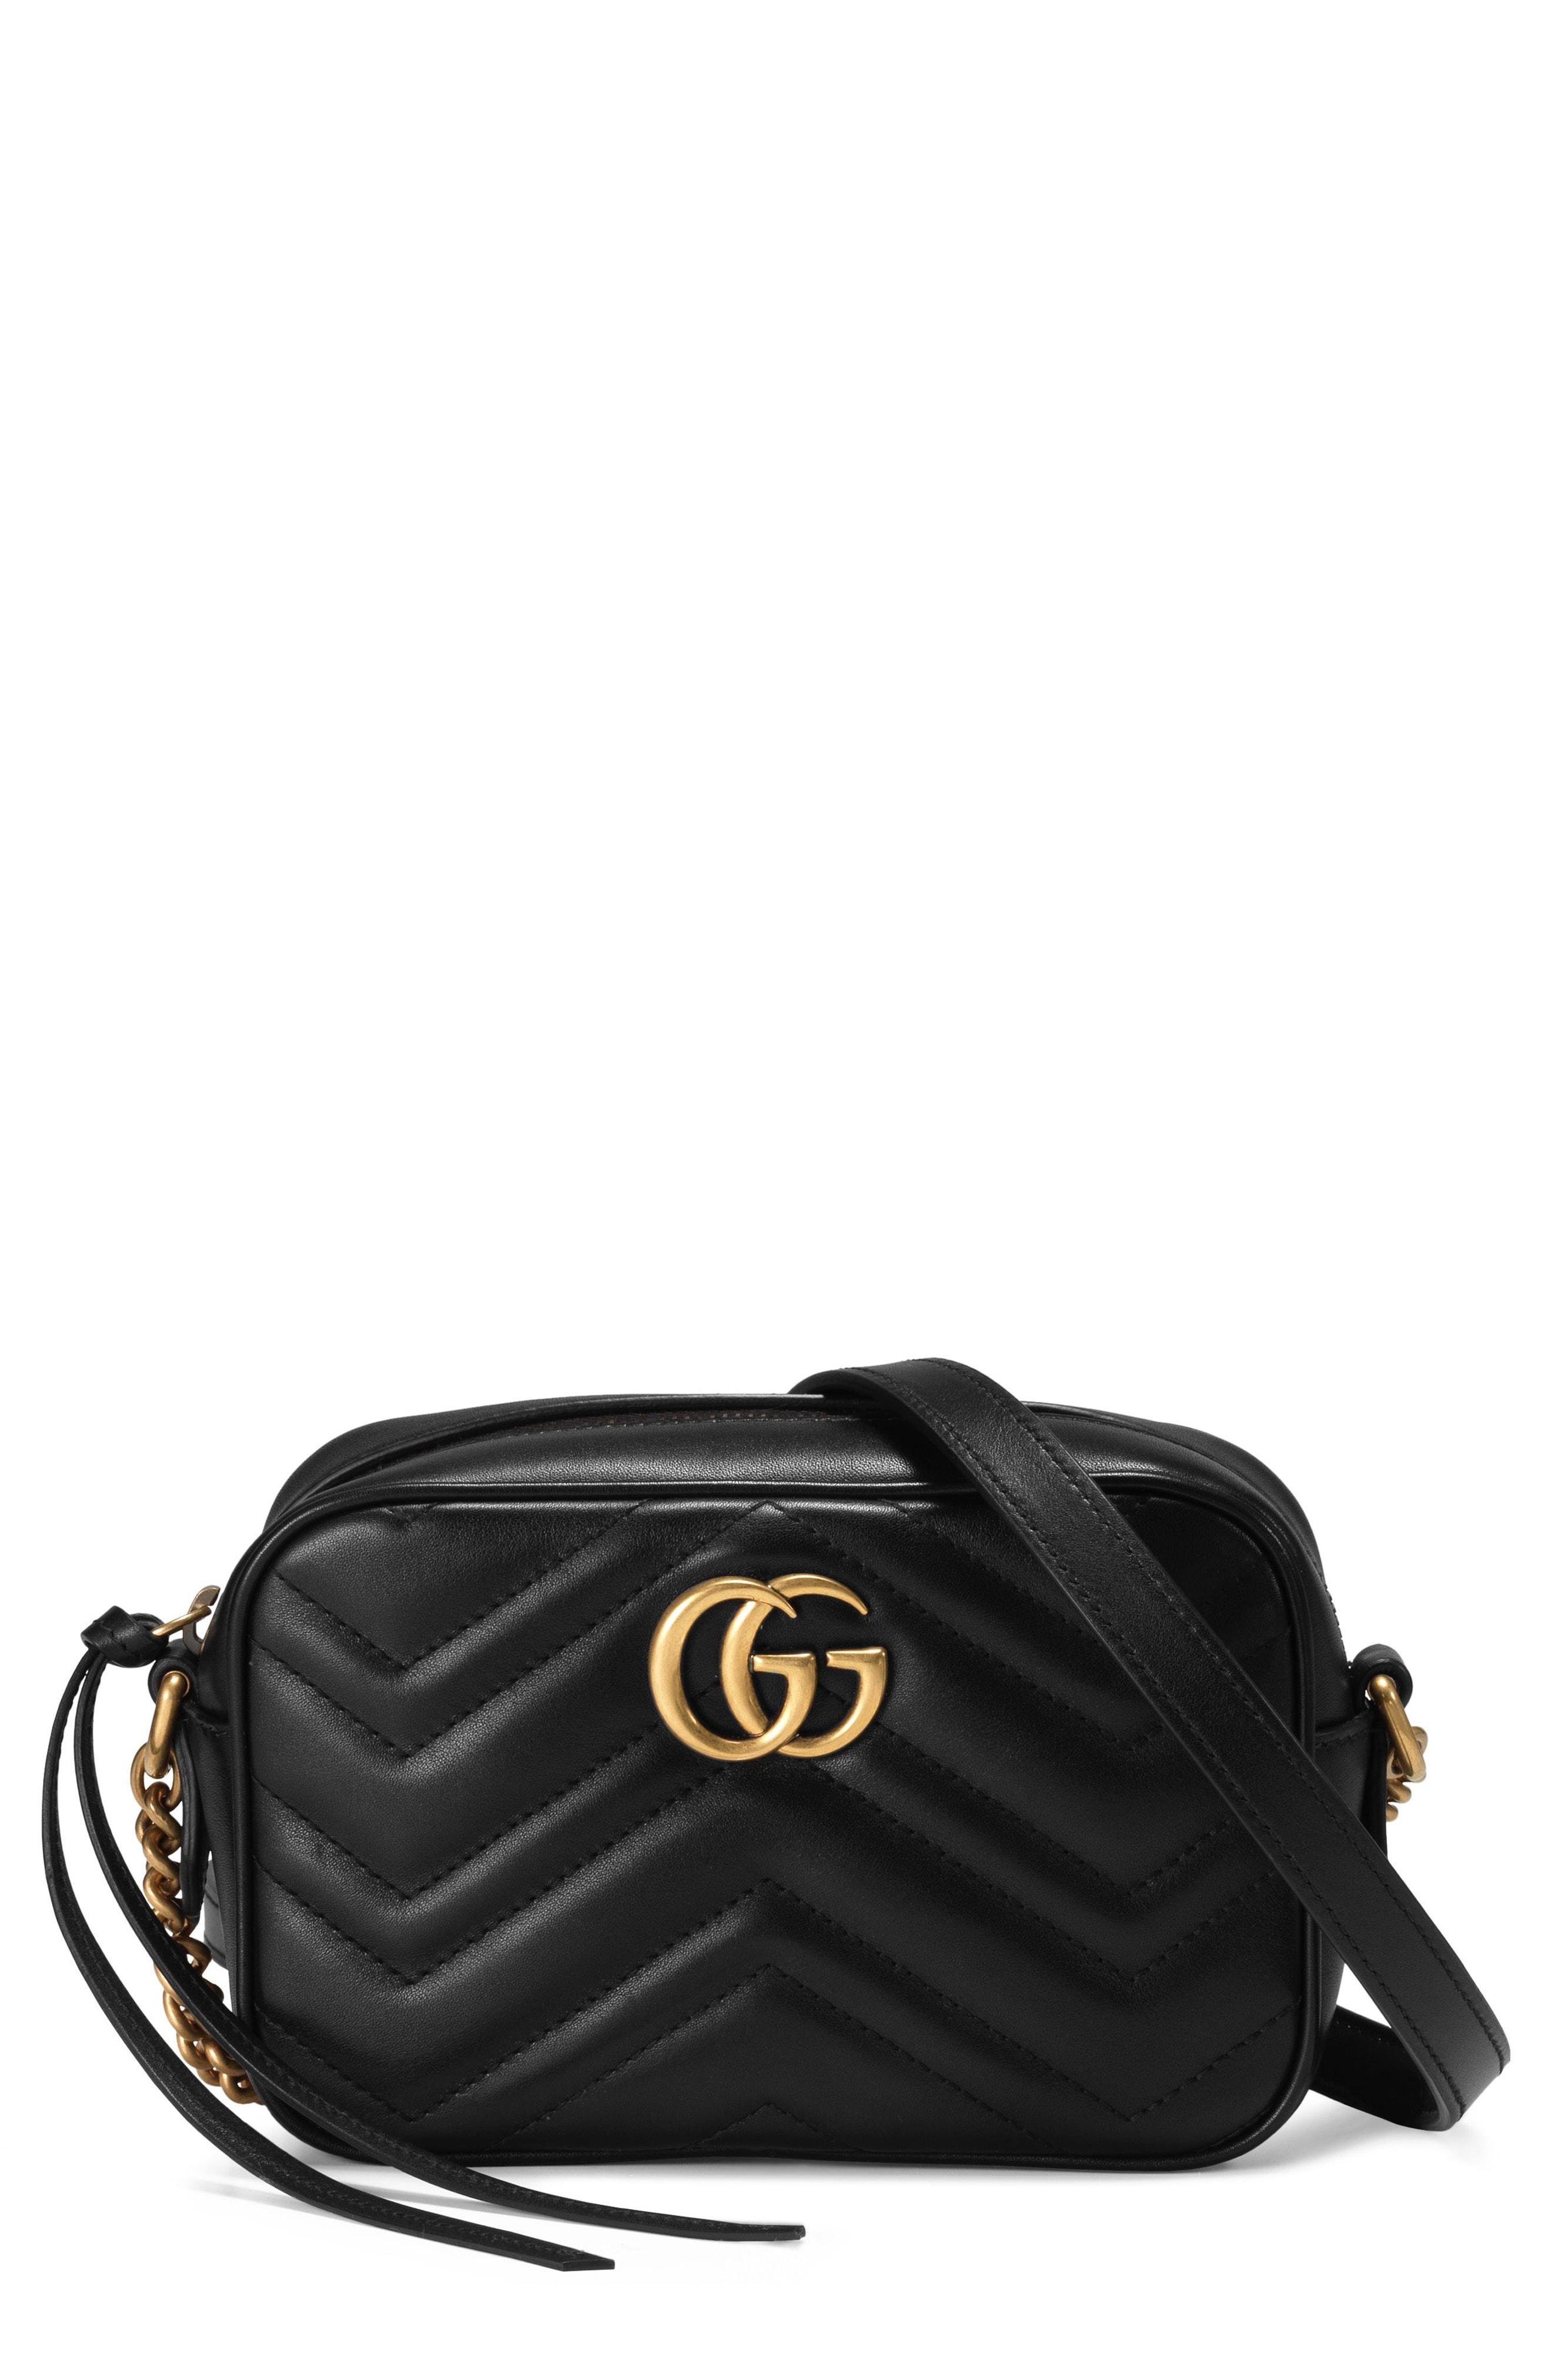 Gucci GG Marmont 2.0 Matelass Leather Shoulder Bag